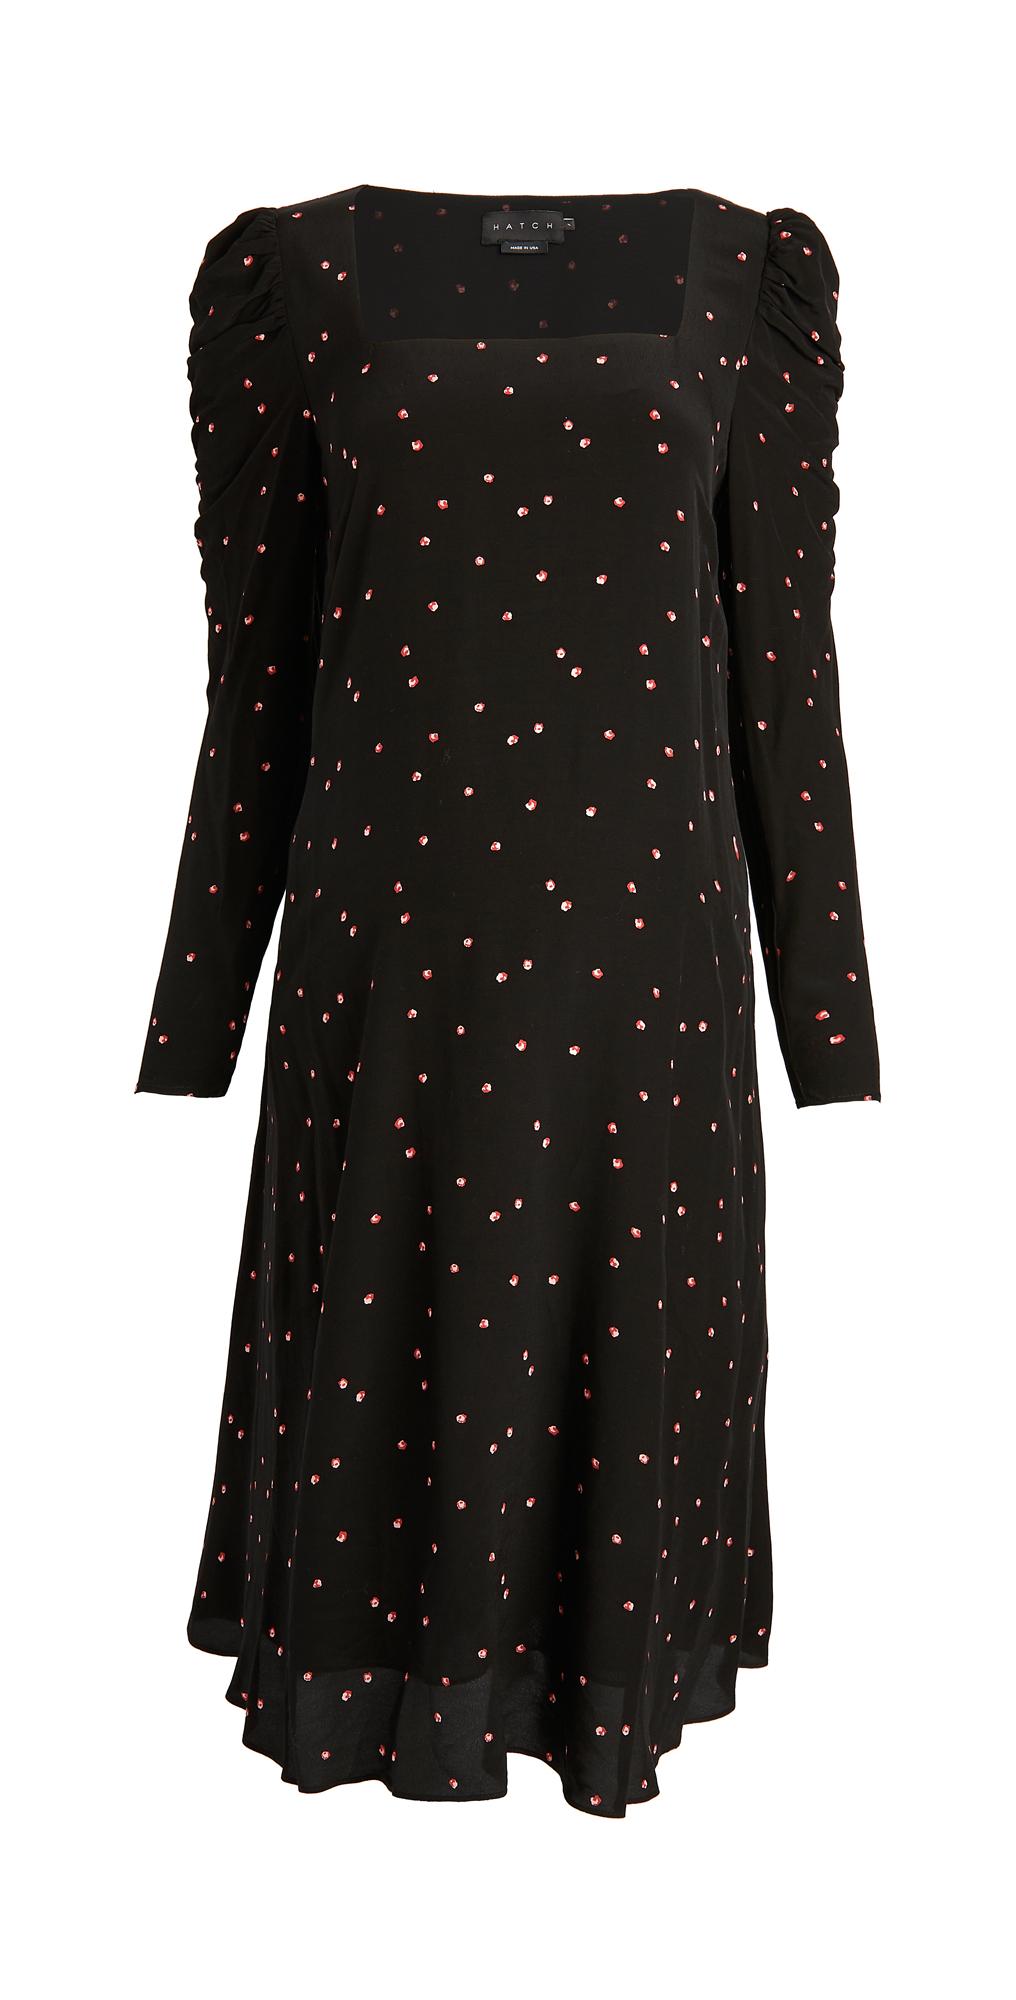 HATCH The Stevie Dress